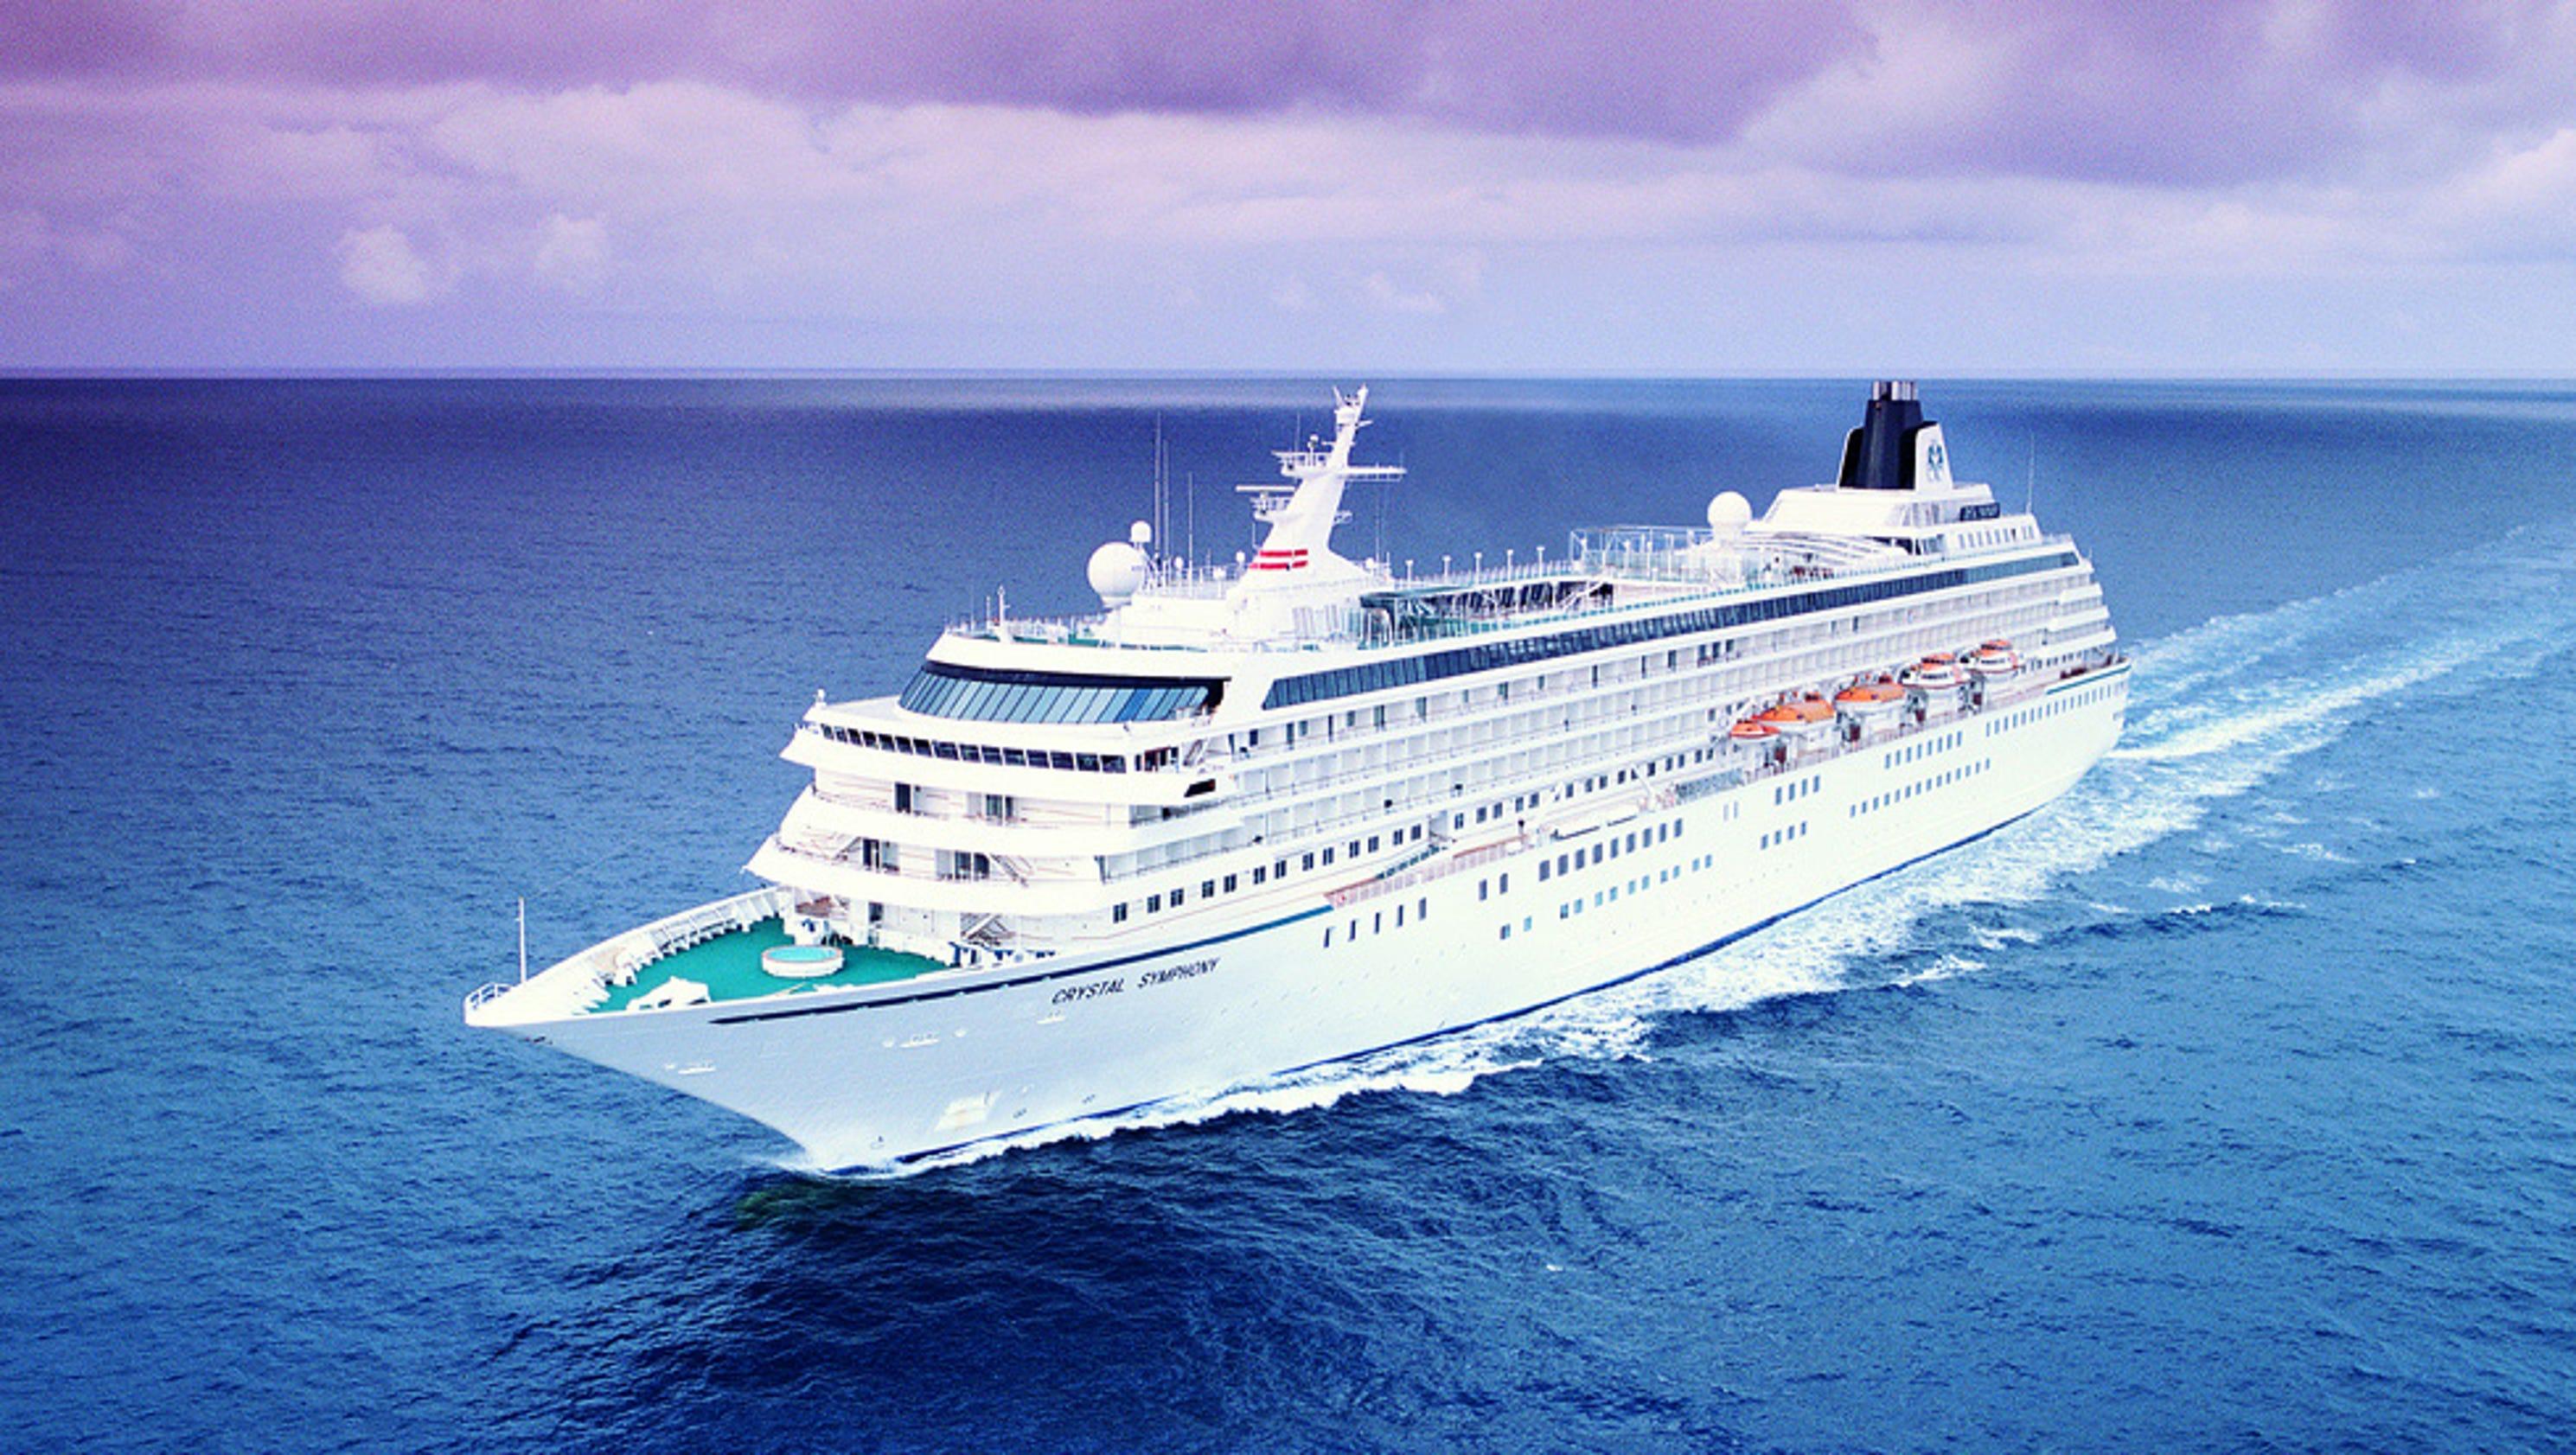 Crystal Cruises World Cruise Brings Days Of Adventure - Symphony cruise ship south africa